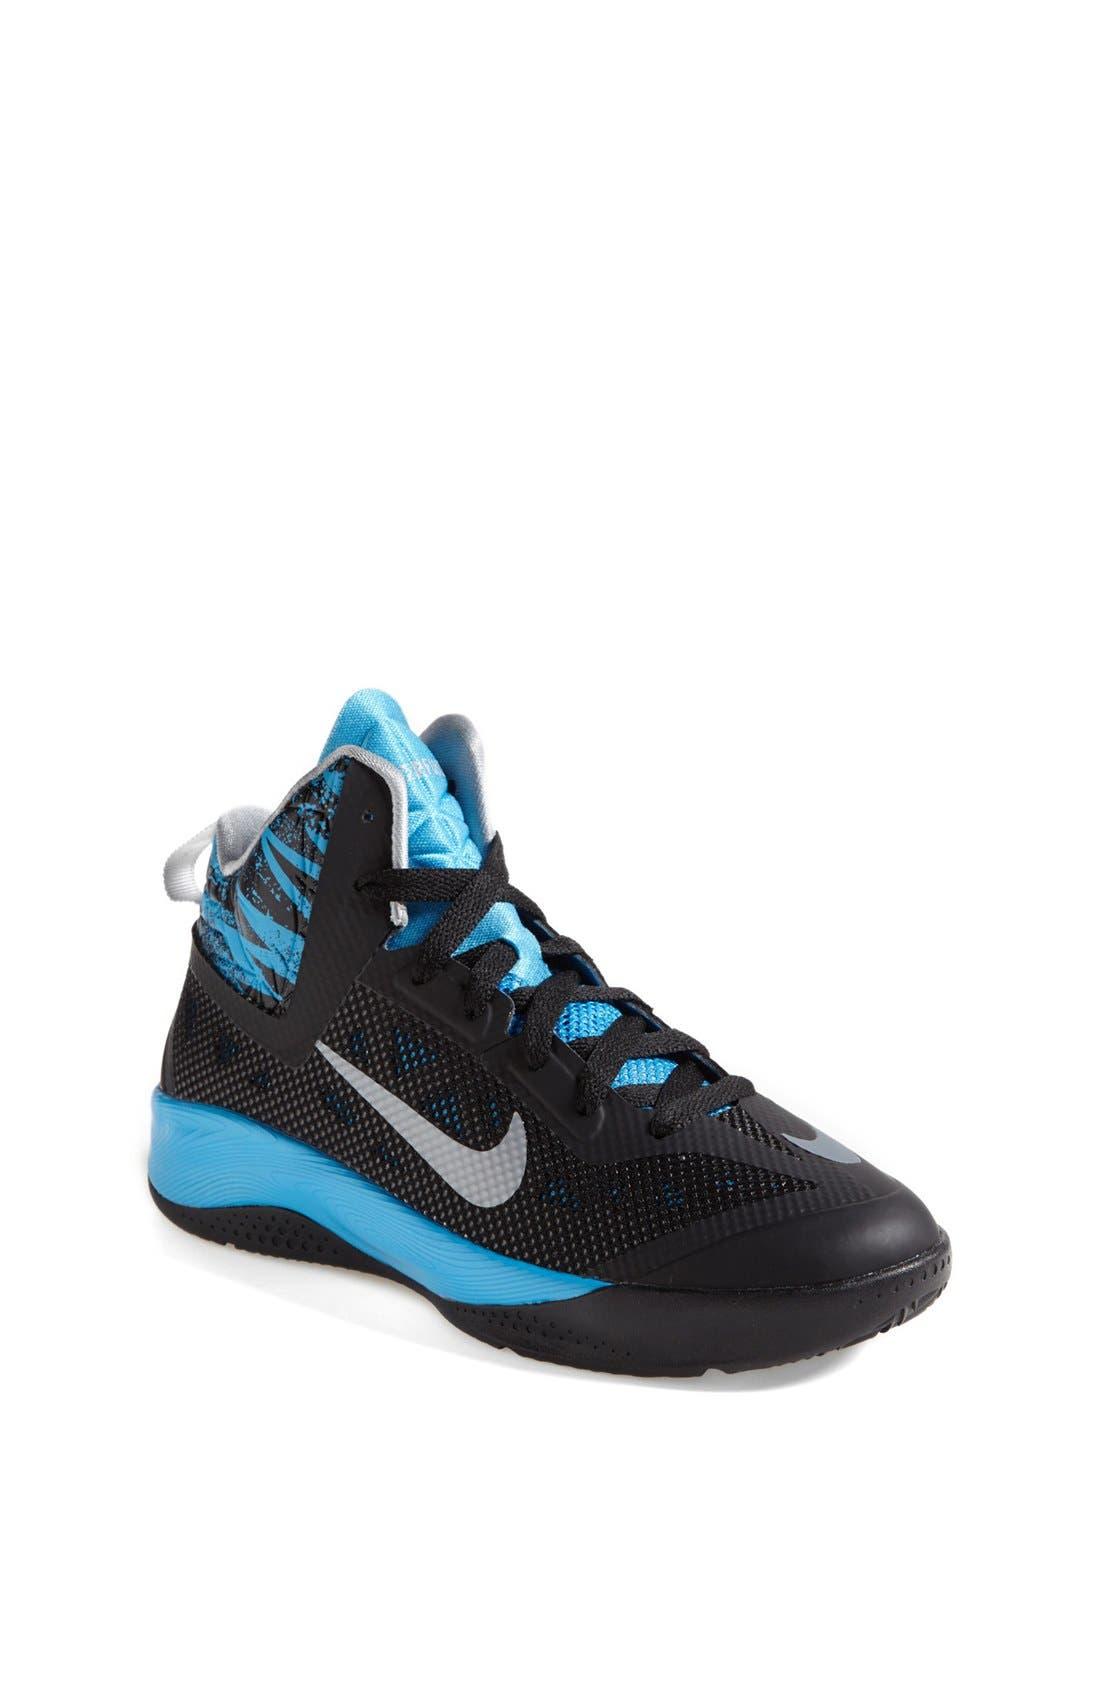 Main Image - Nike 'Hyperfuse 2013' Basketball Shoe (Big Kid)